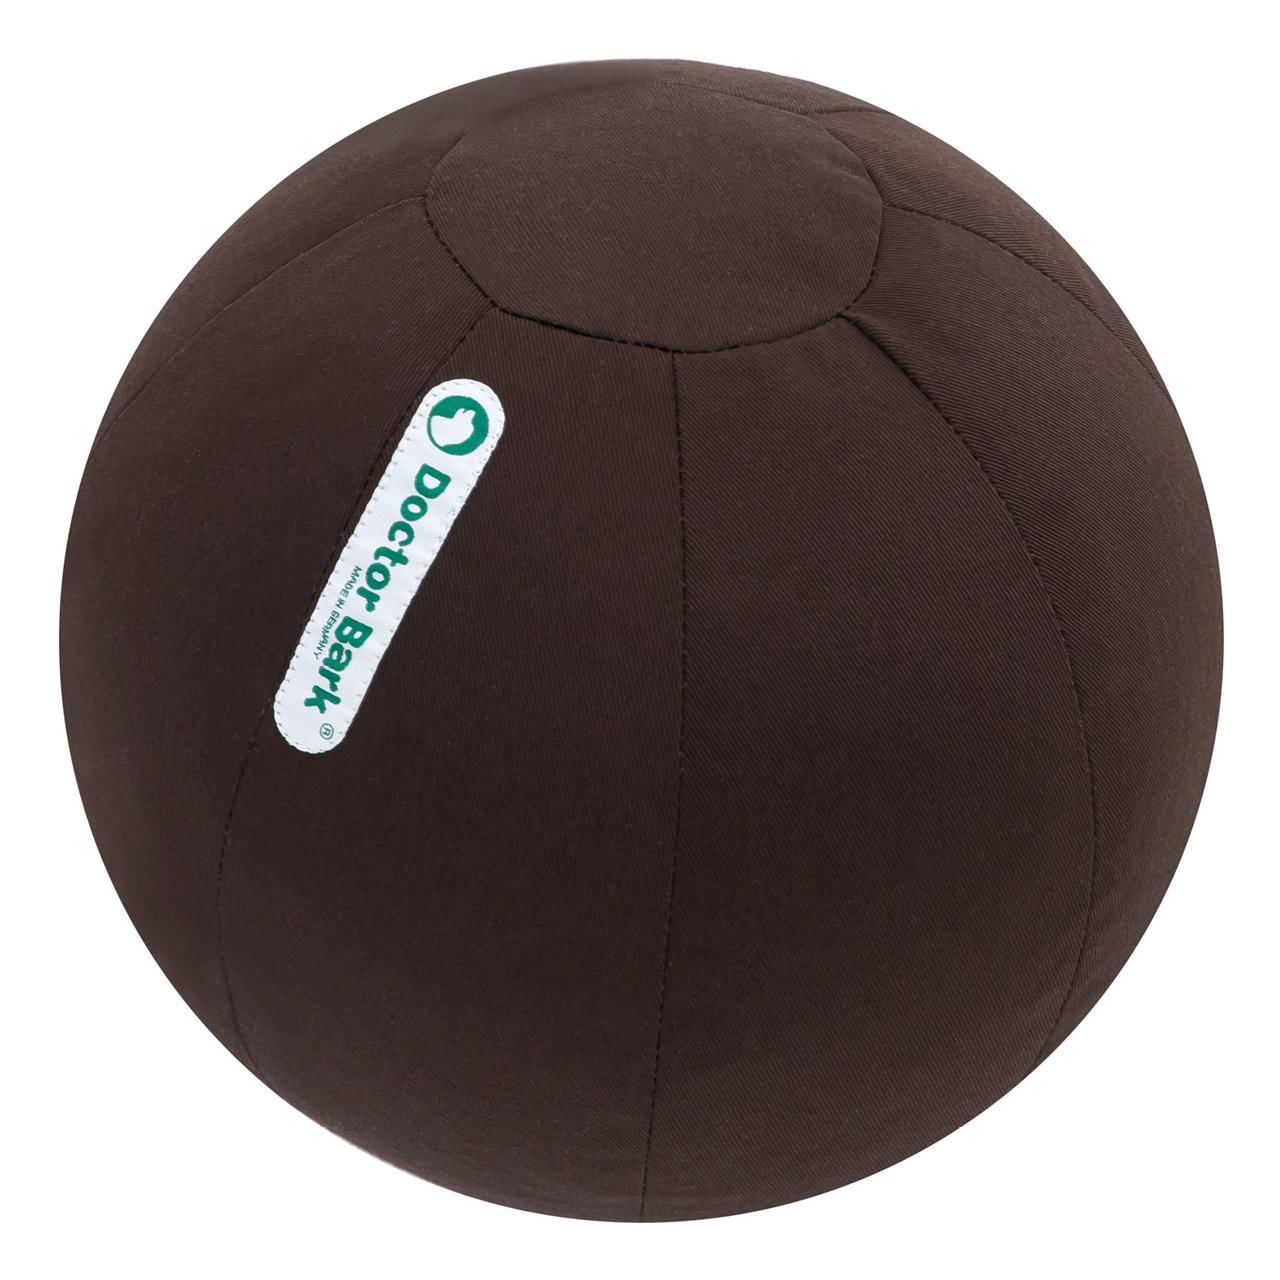 Toy Ball braun